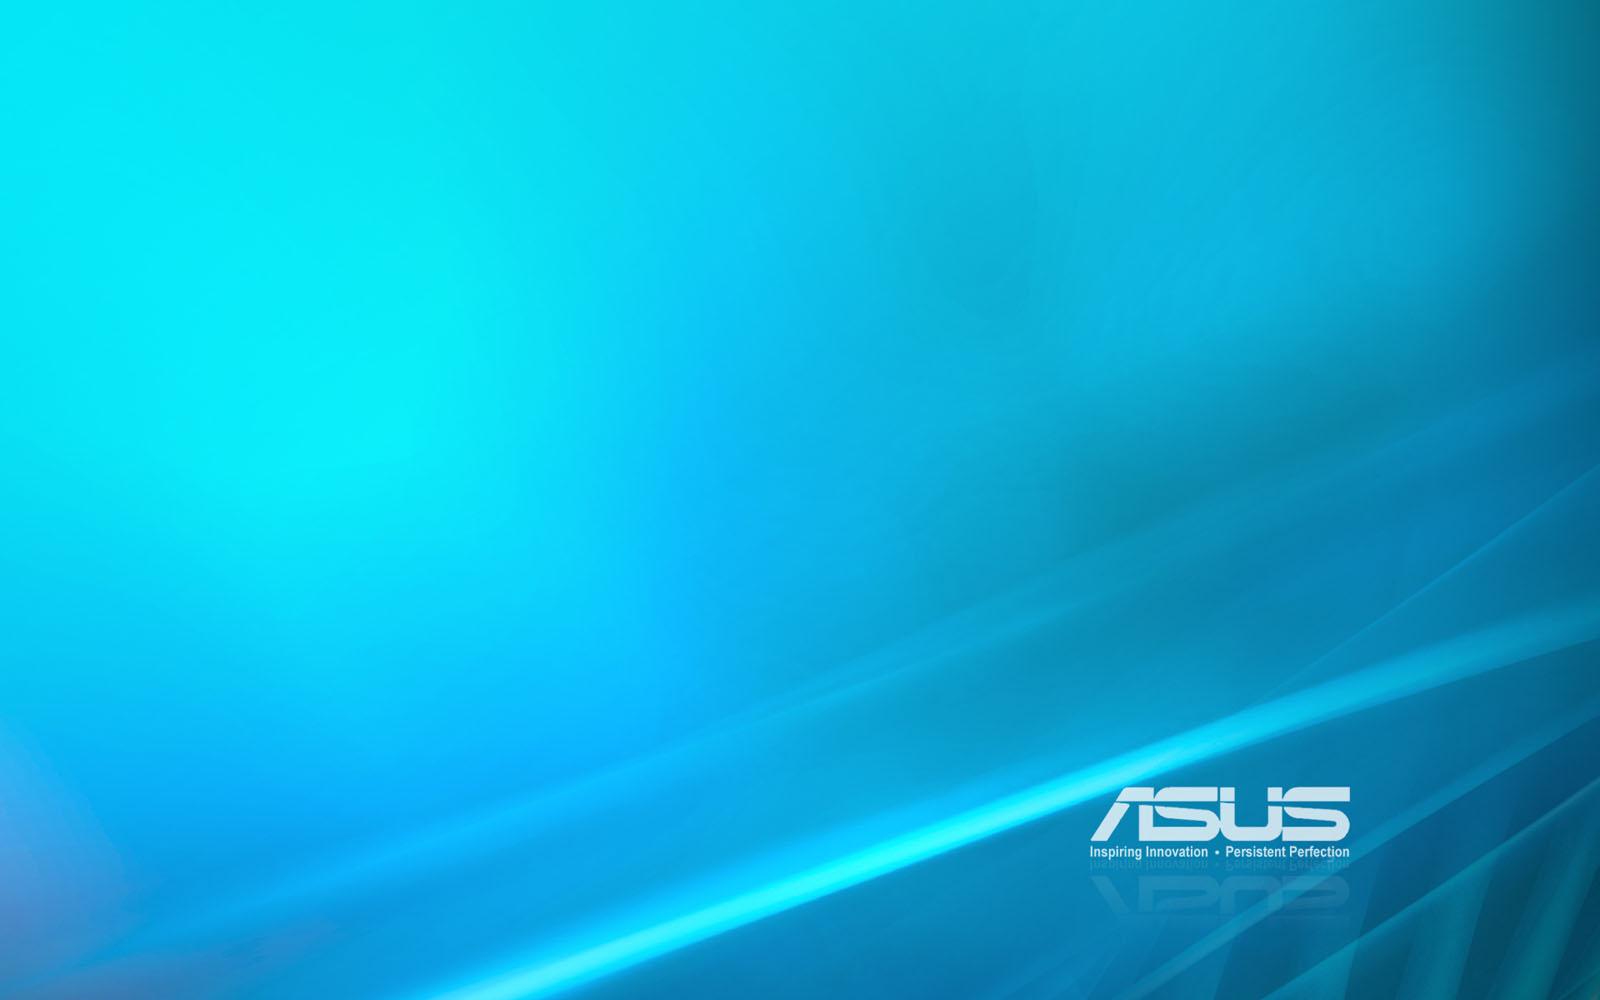 Asu Football Wallpaper: ASU Desktop Wallpaper